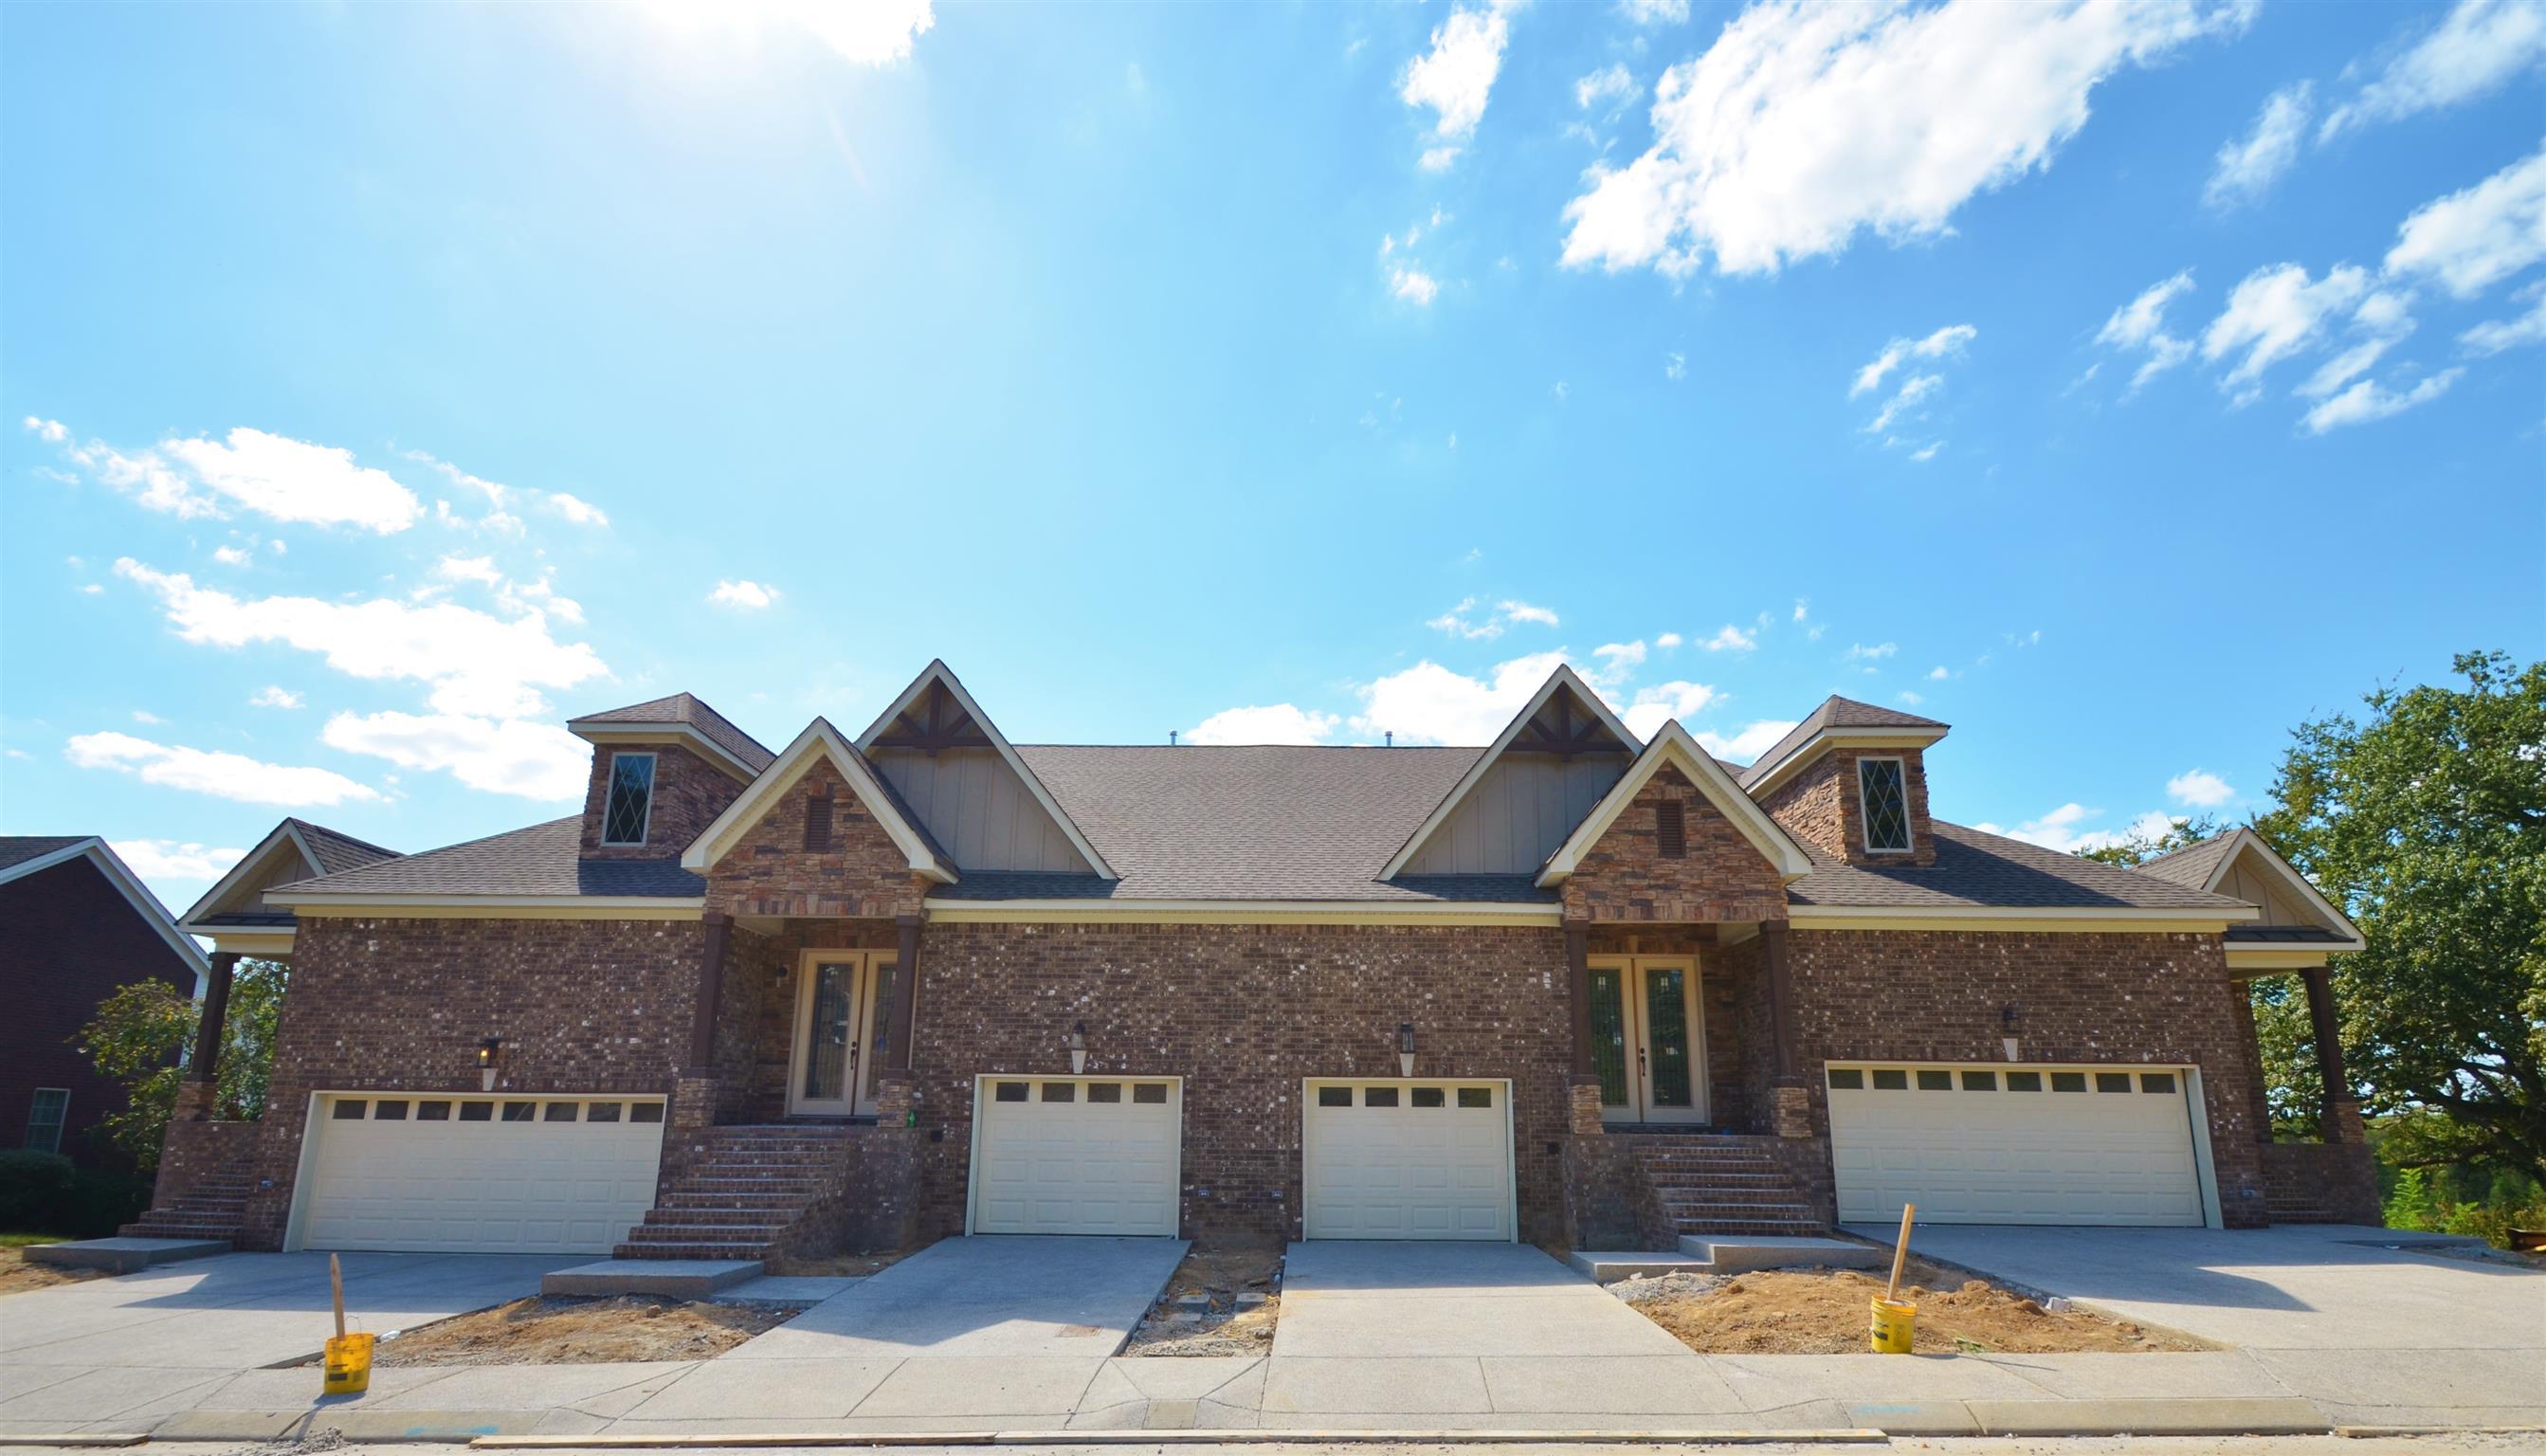 5006 Southfork Blvd #20, Old Hickory, TN 37138 - Old Hickory, TN real estate listing